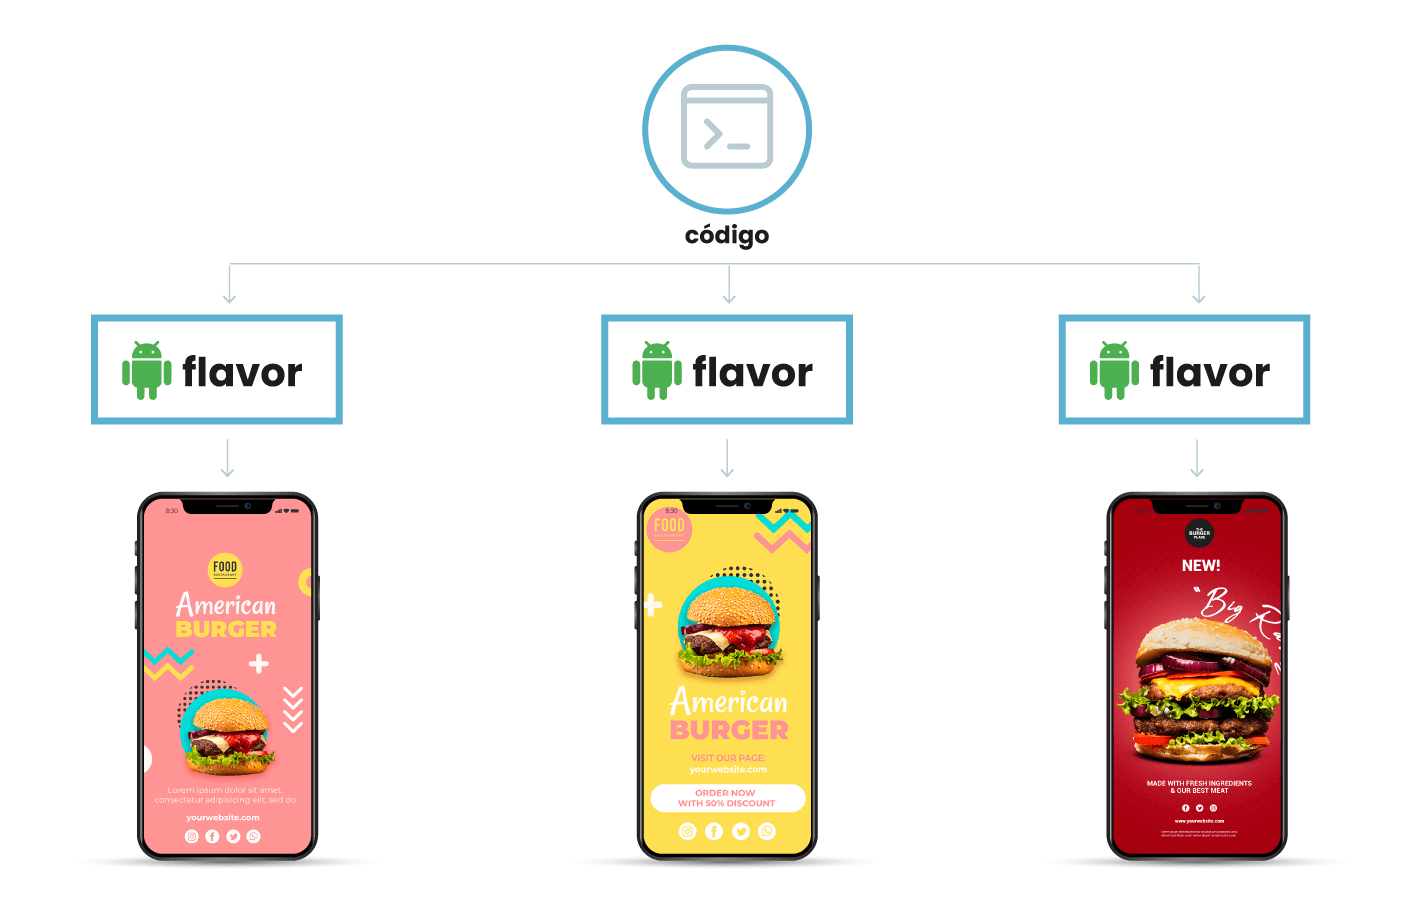 flavor2